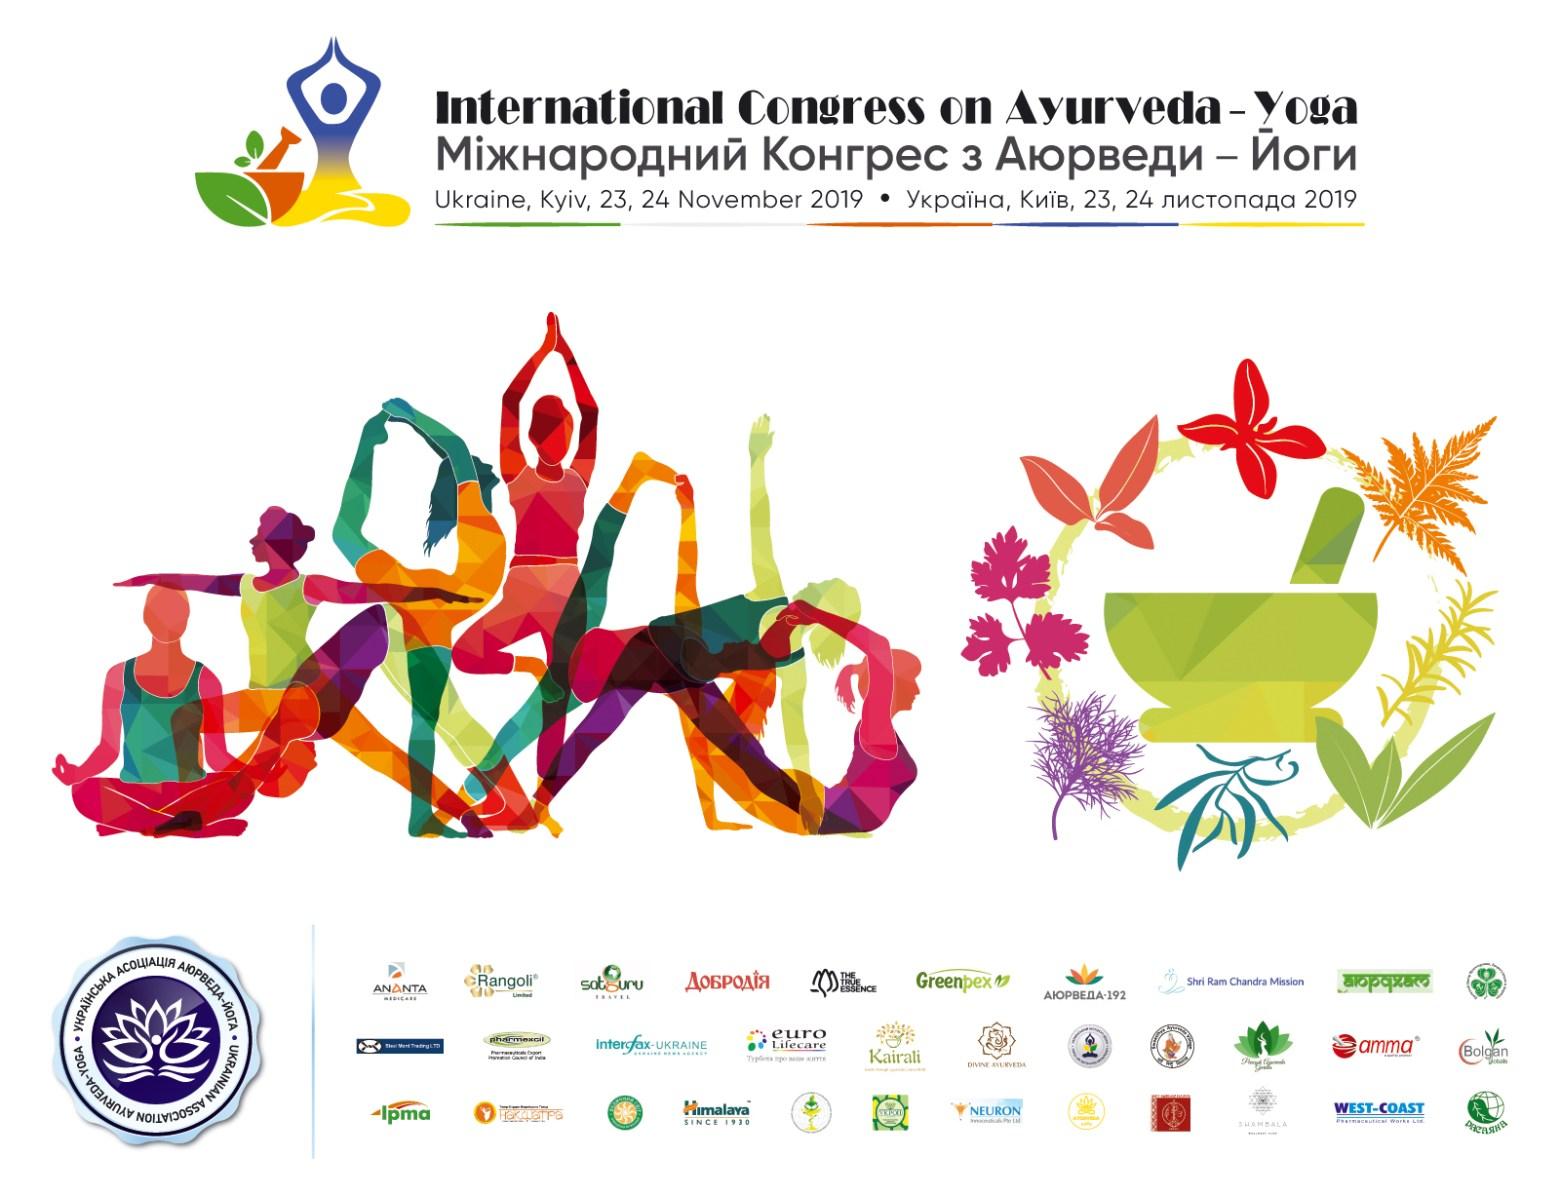 International Congress on Ayurveda and Yoga